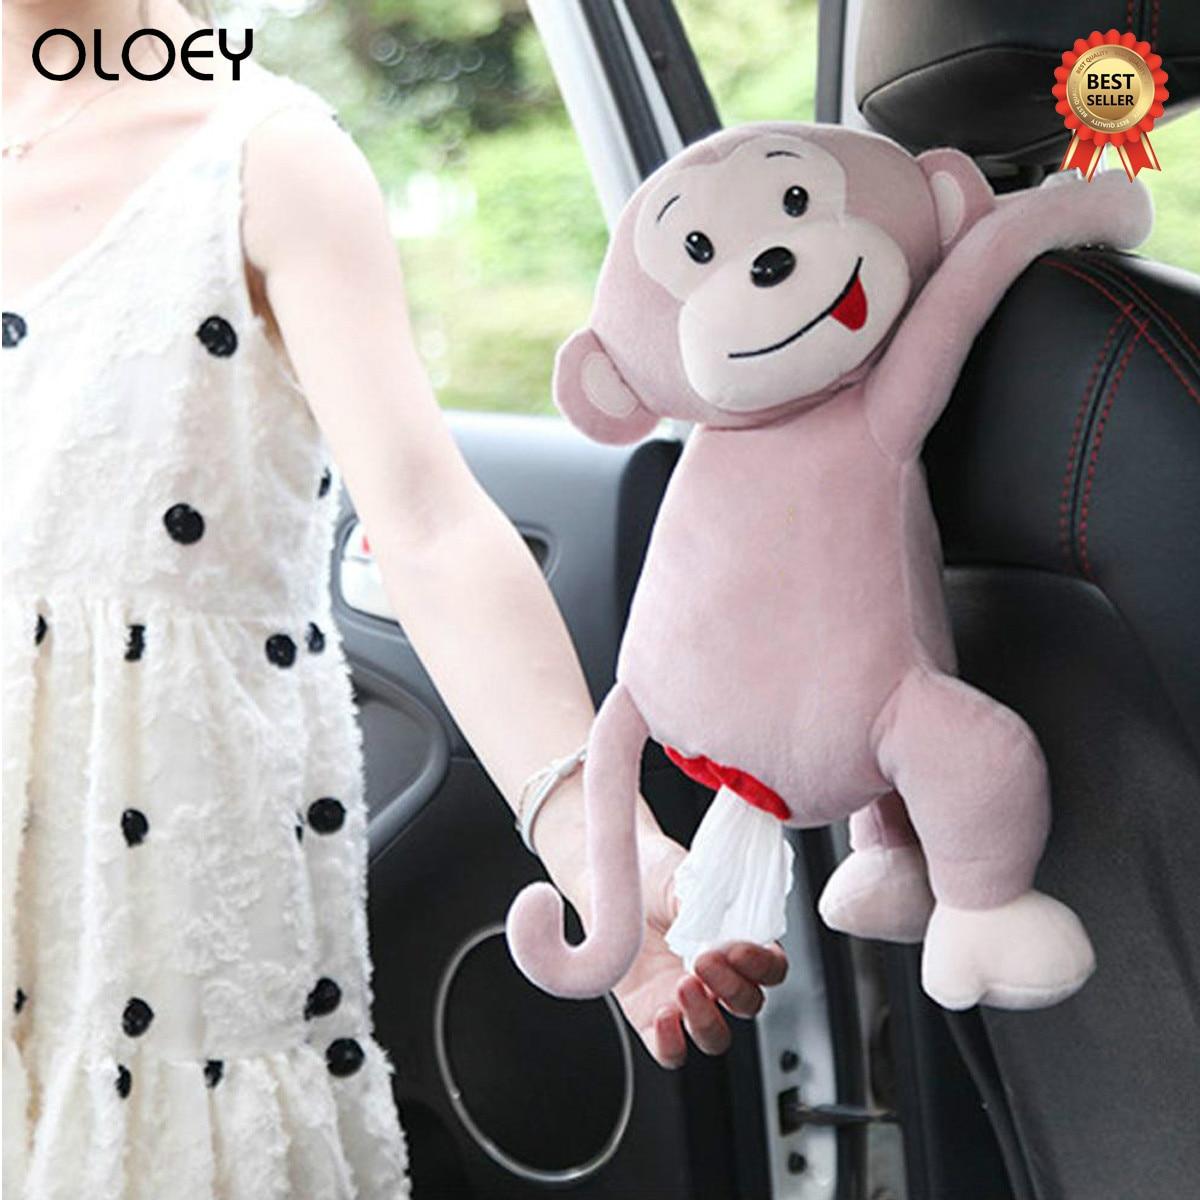 2019 Creative Tissue Box Pippi Monkey Paper Napkin Case Cute Cartoon Animals Car Paper Boxes Napkin Holder Organizers Box